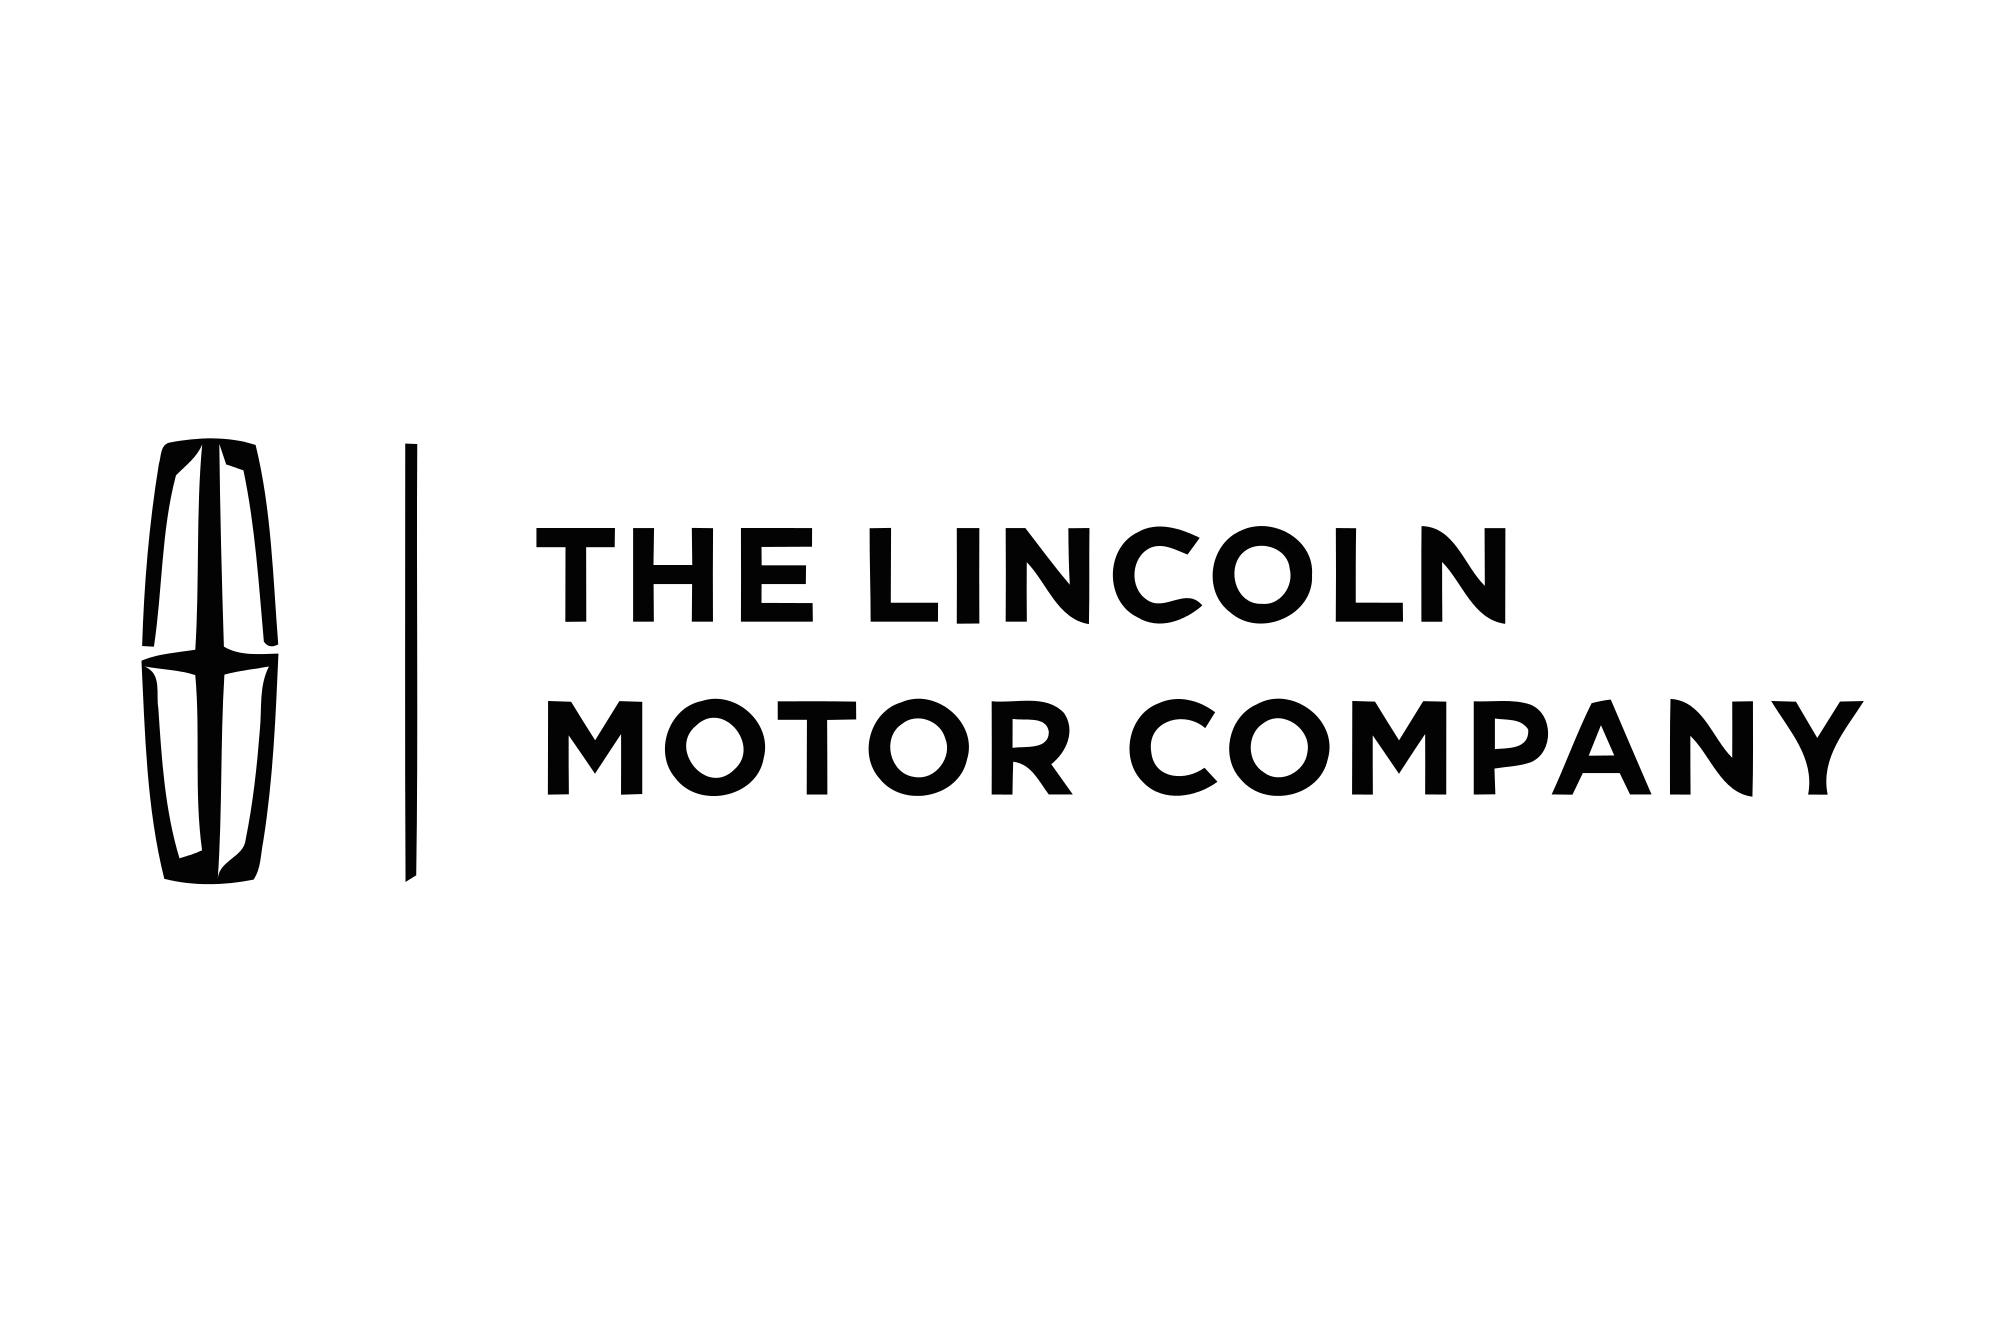 Lincoln-Motor-Company-logo.jpg